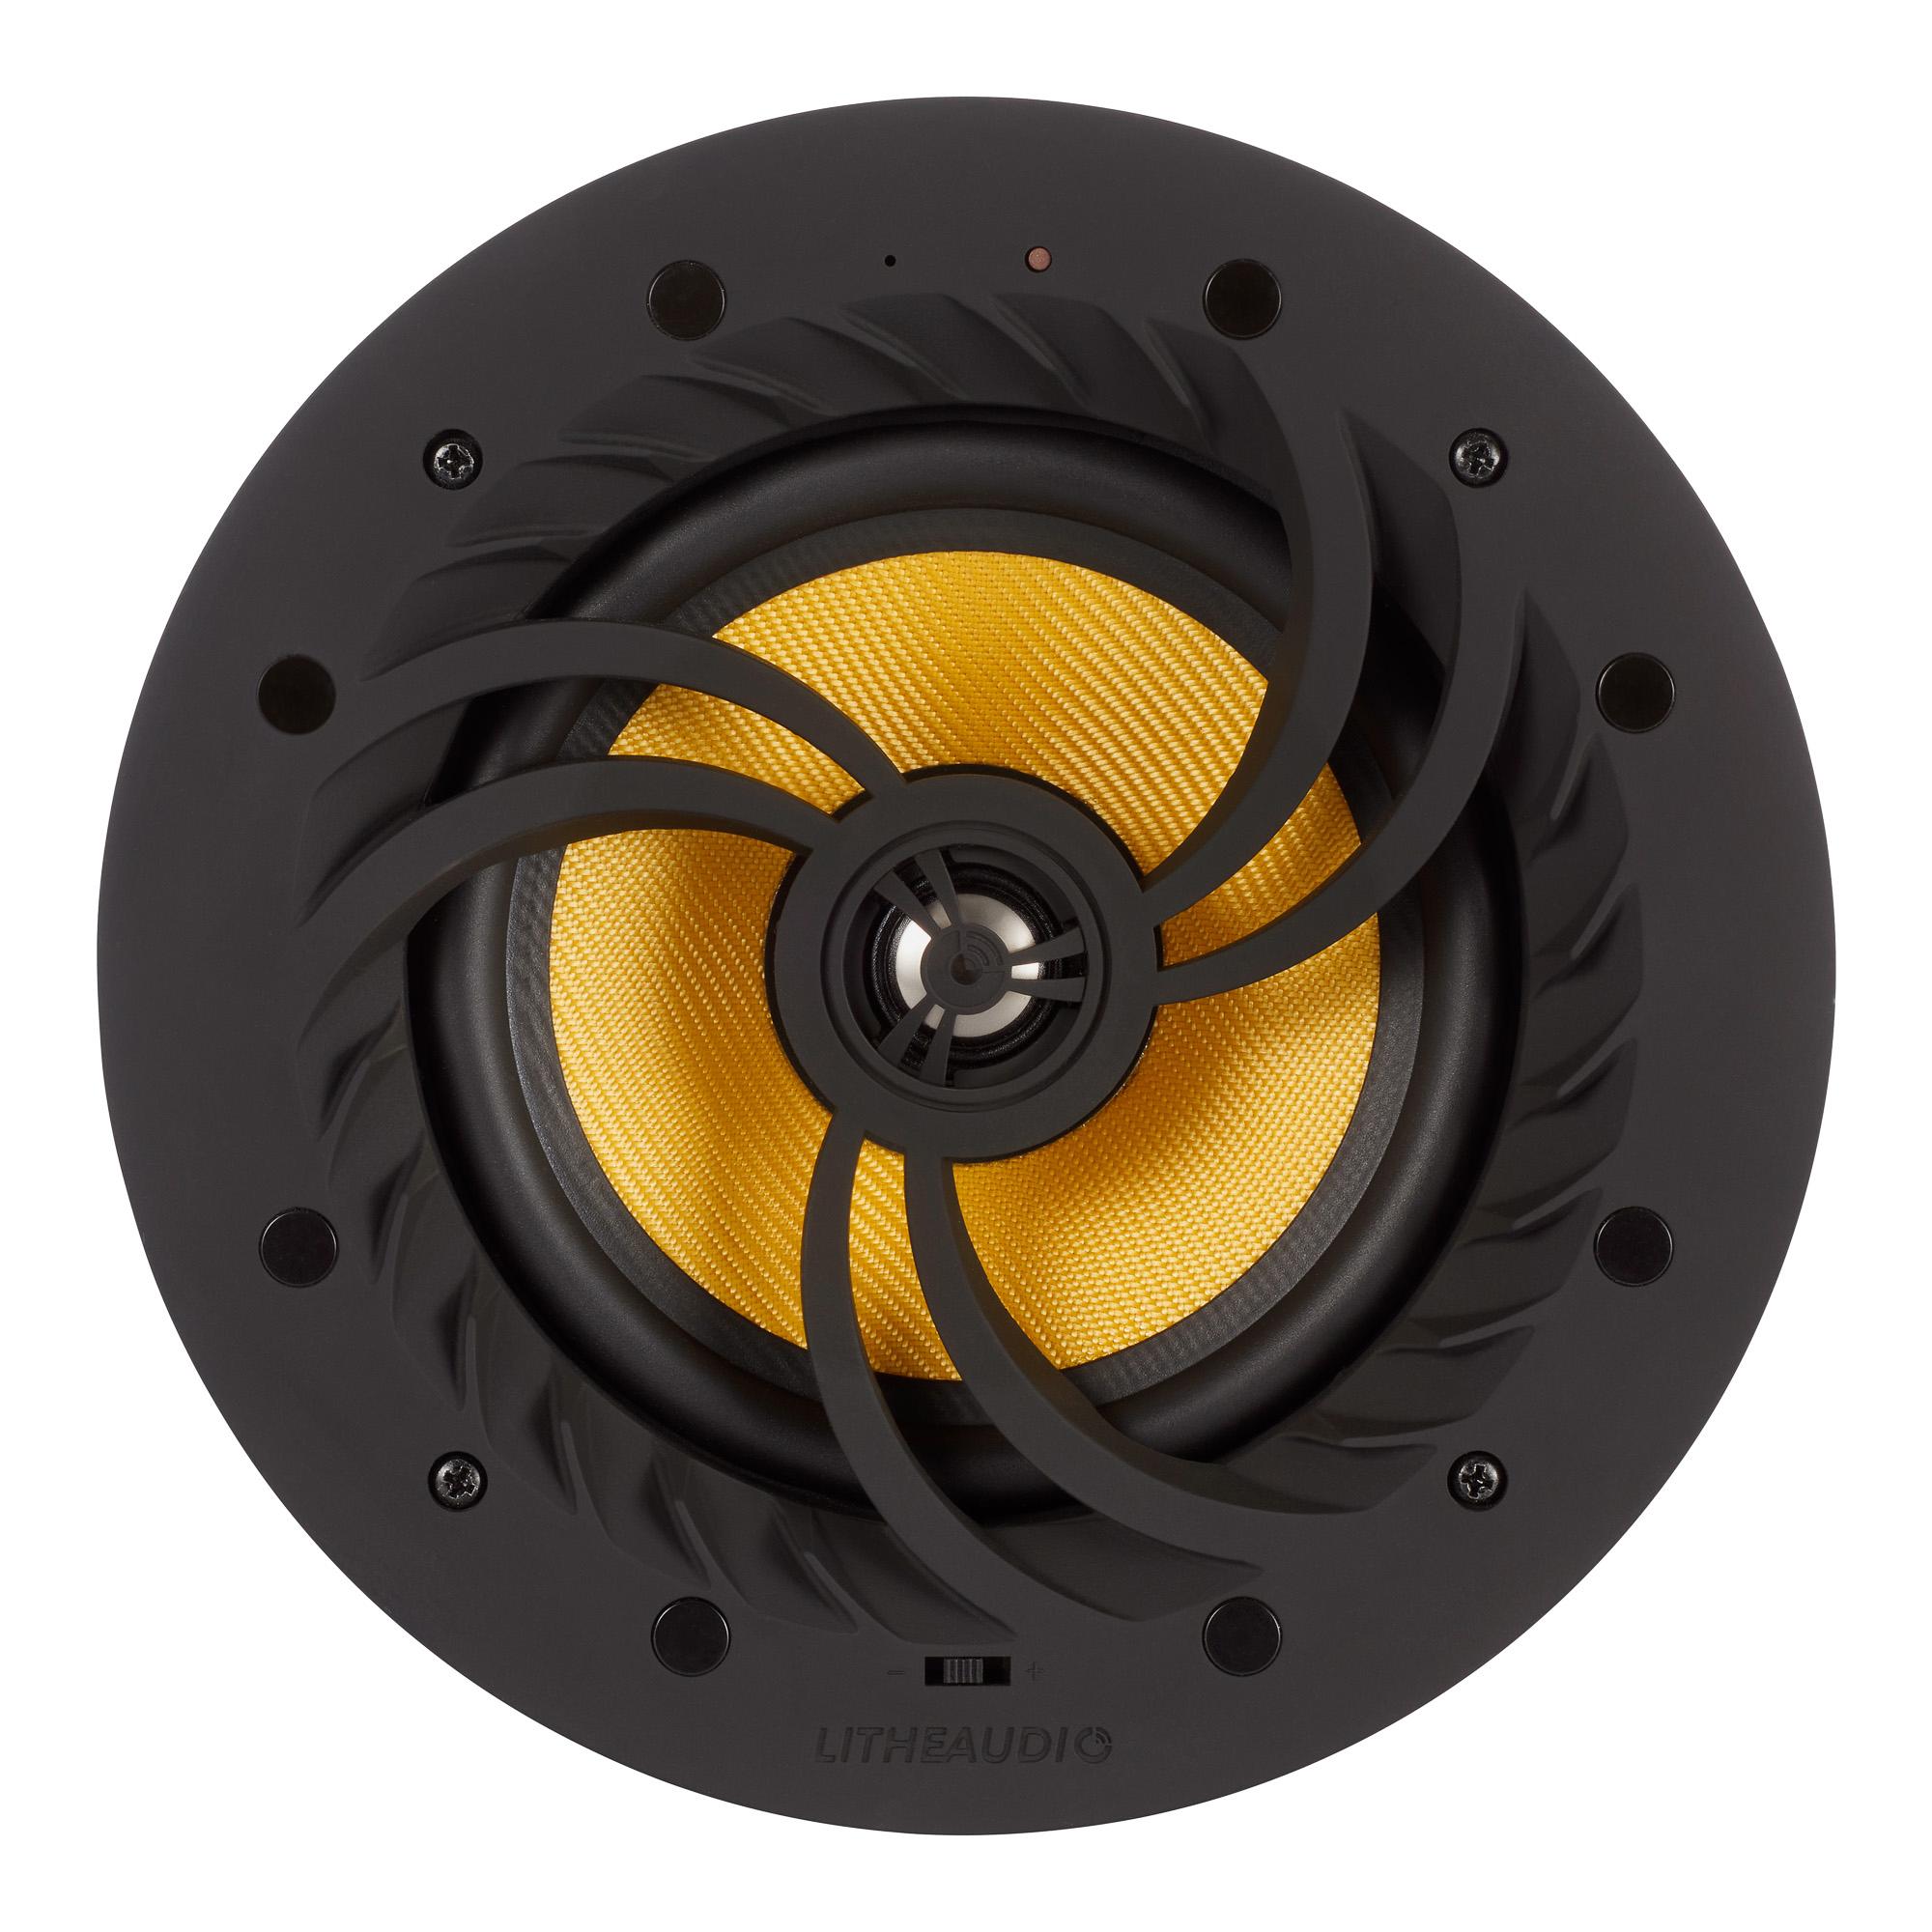 06500EU, Pro Series Wi-Fi ceiling speaker (single - master)